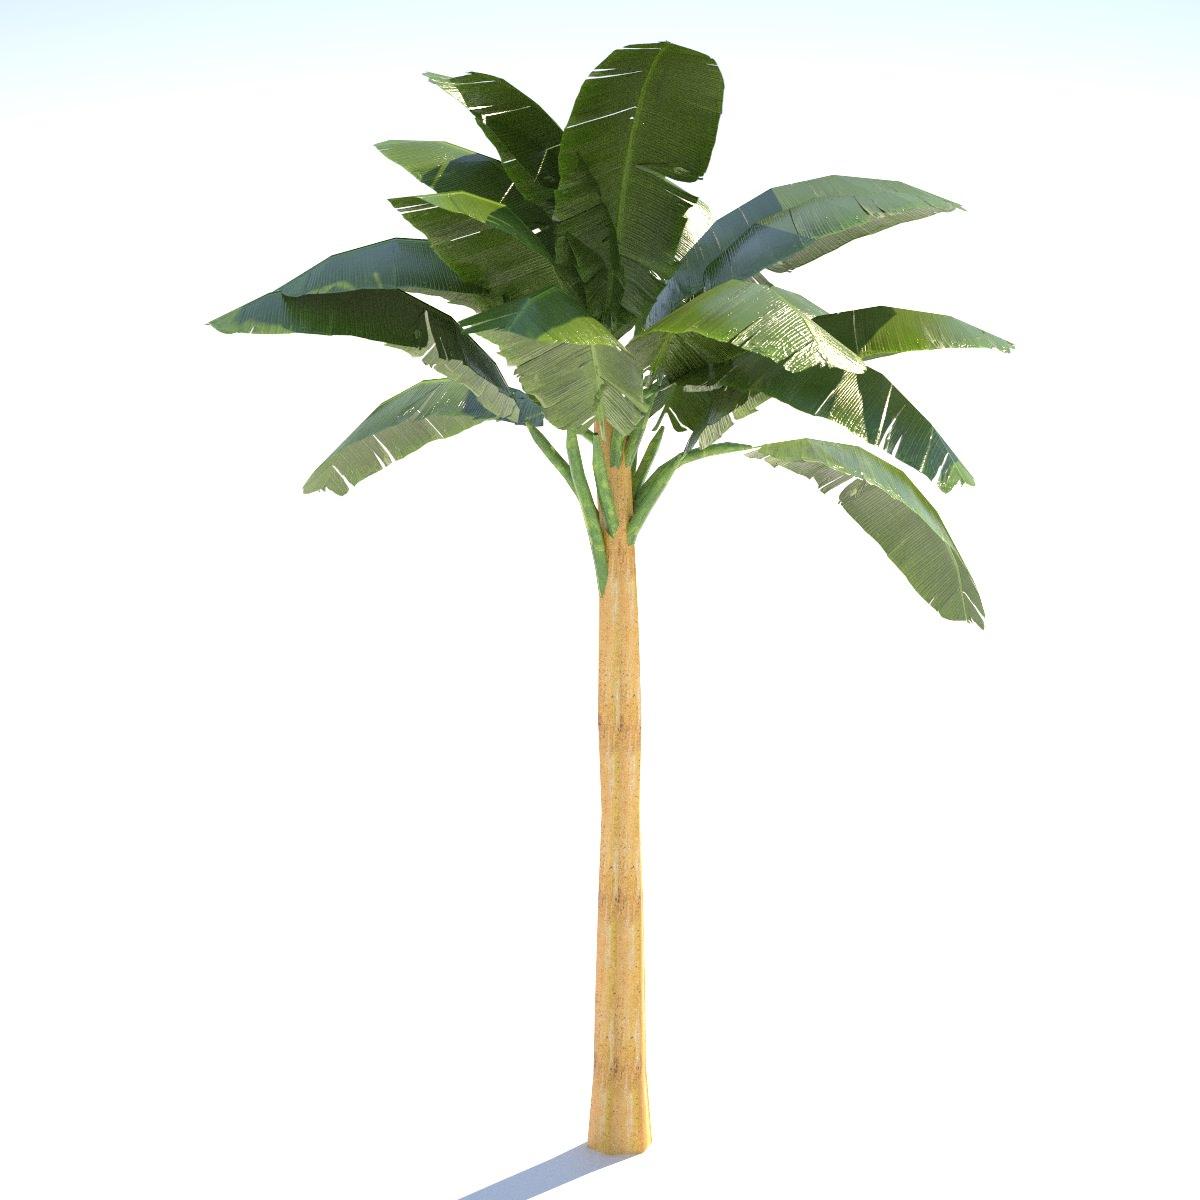 Banana Tree 02 Low Poly 3d Model Game Ready Obj 3ds Fbx Hrc Xsi Dae Skp